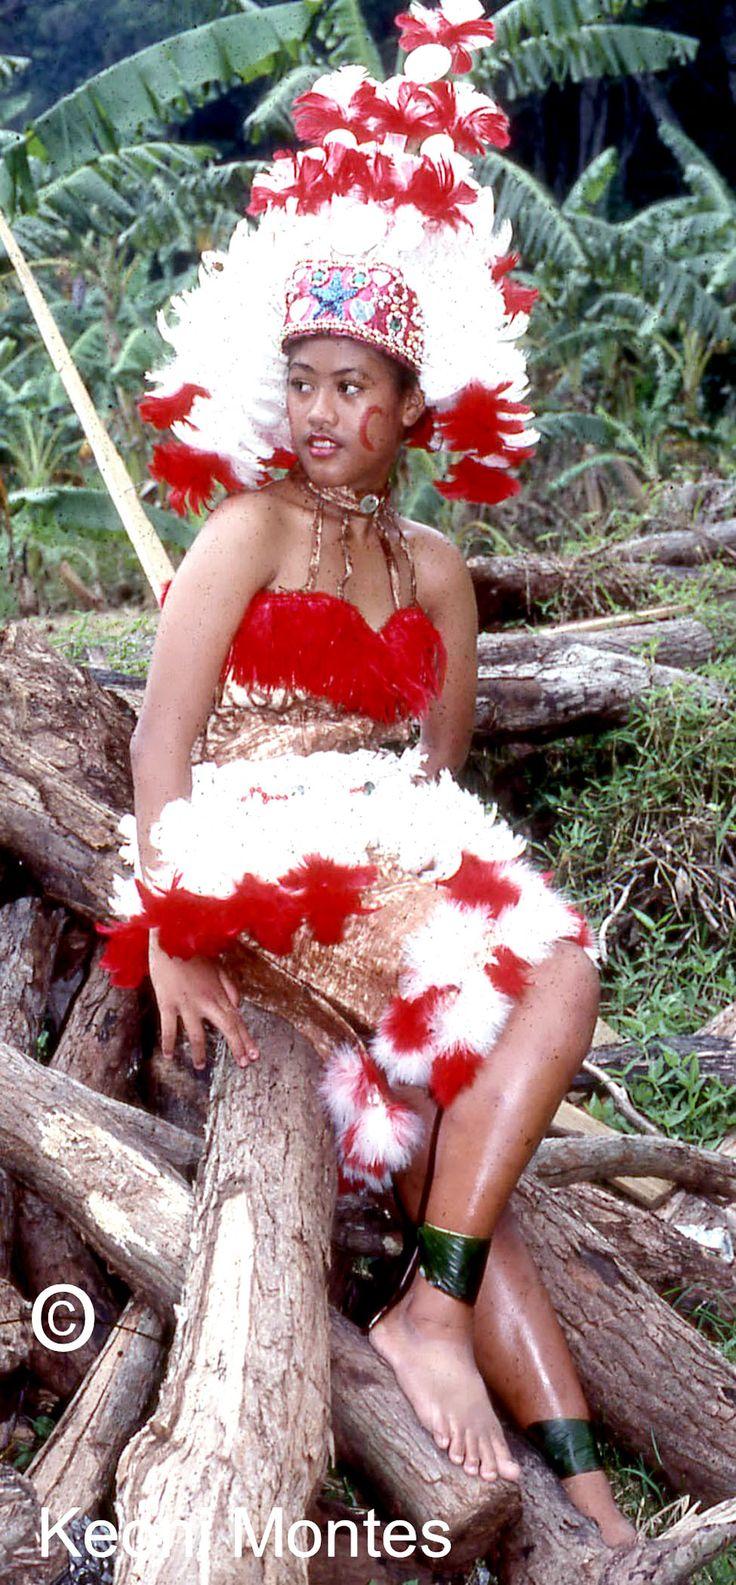 samoa asian personals Beautiful polynesian and pacific women, sunshine 35k likes beautiful polynesian/pacific islander women.